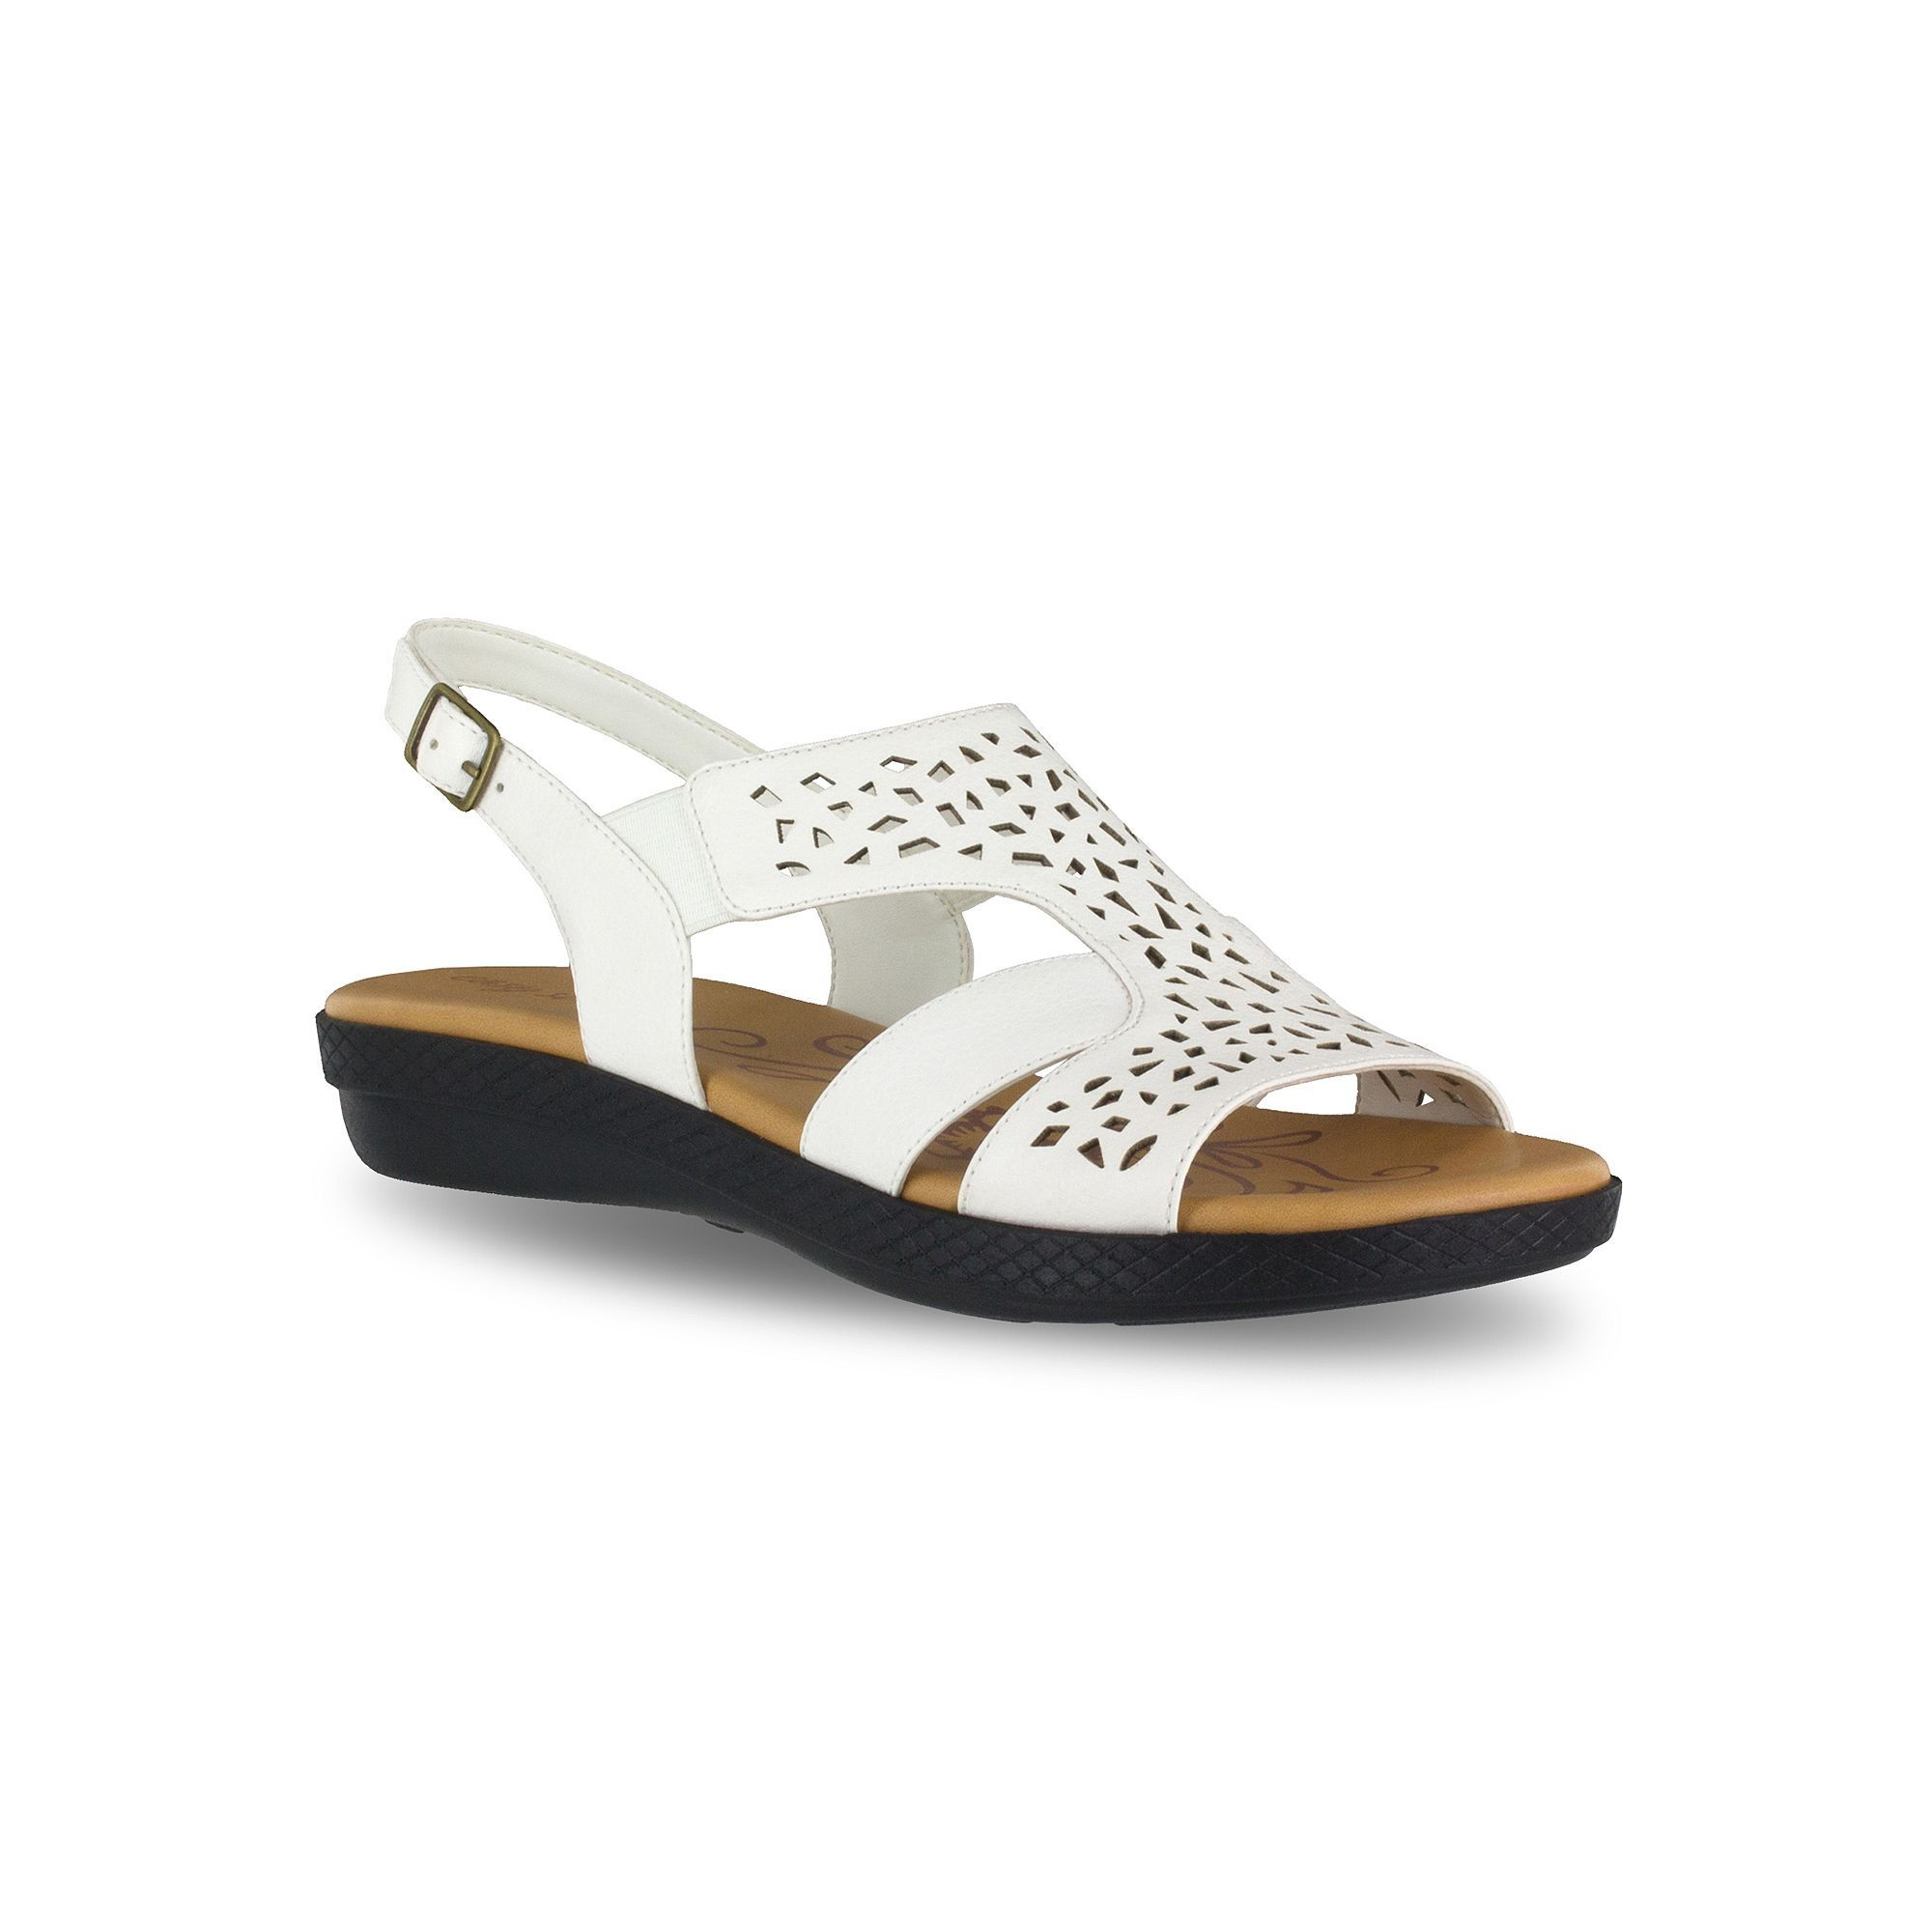 Easy Street Bolt Women's Sandals in